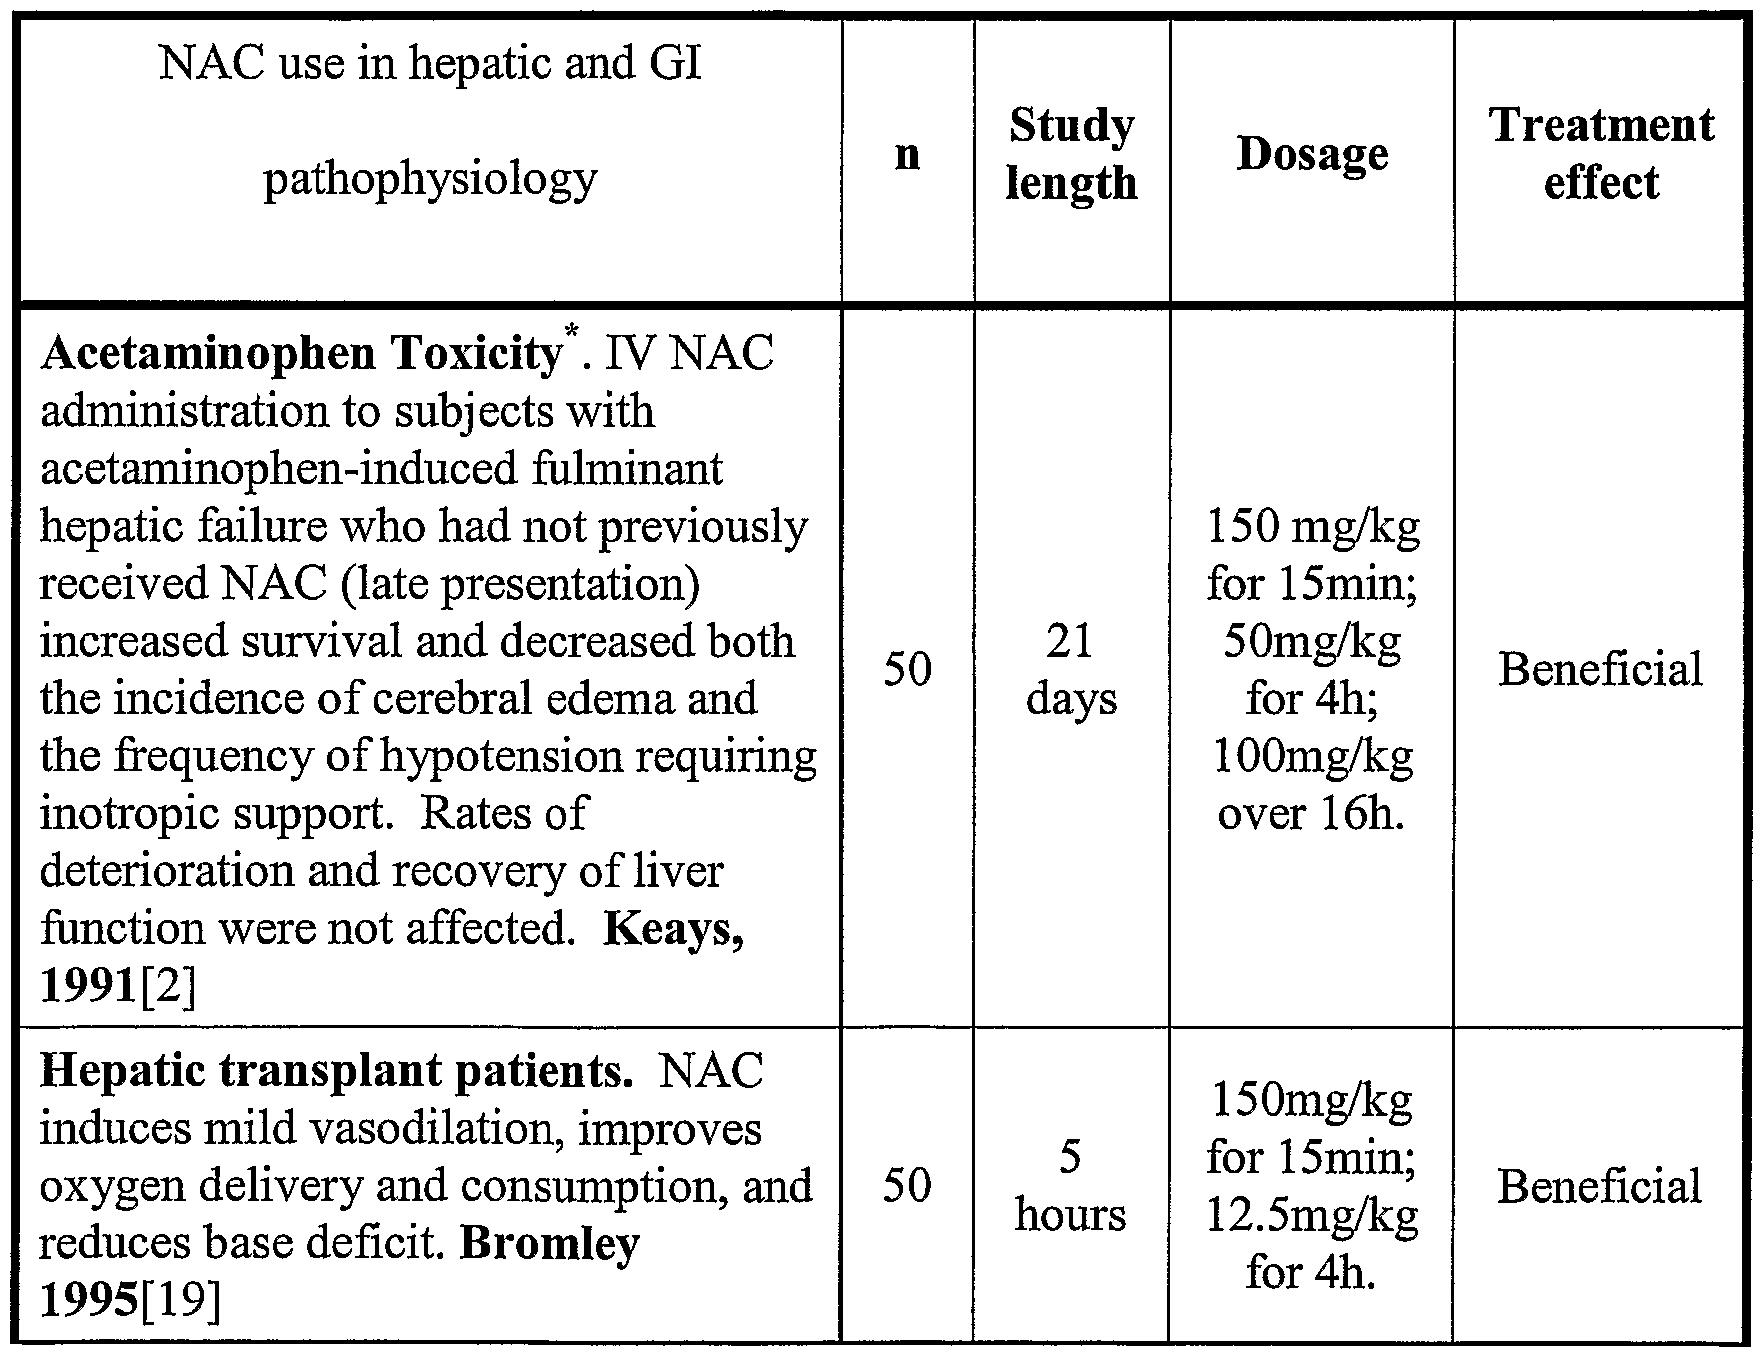 nac in chronic tylenol ingestion